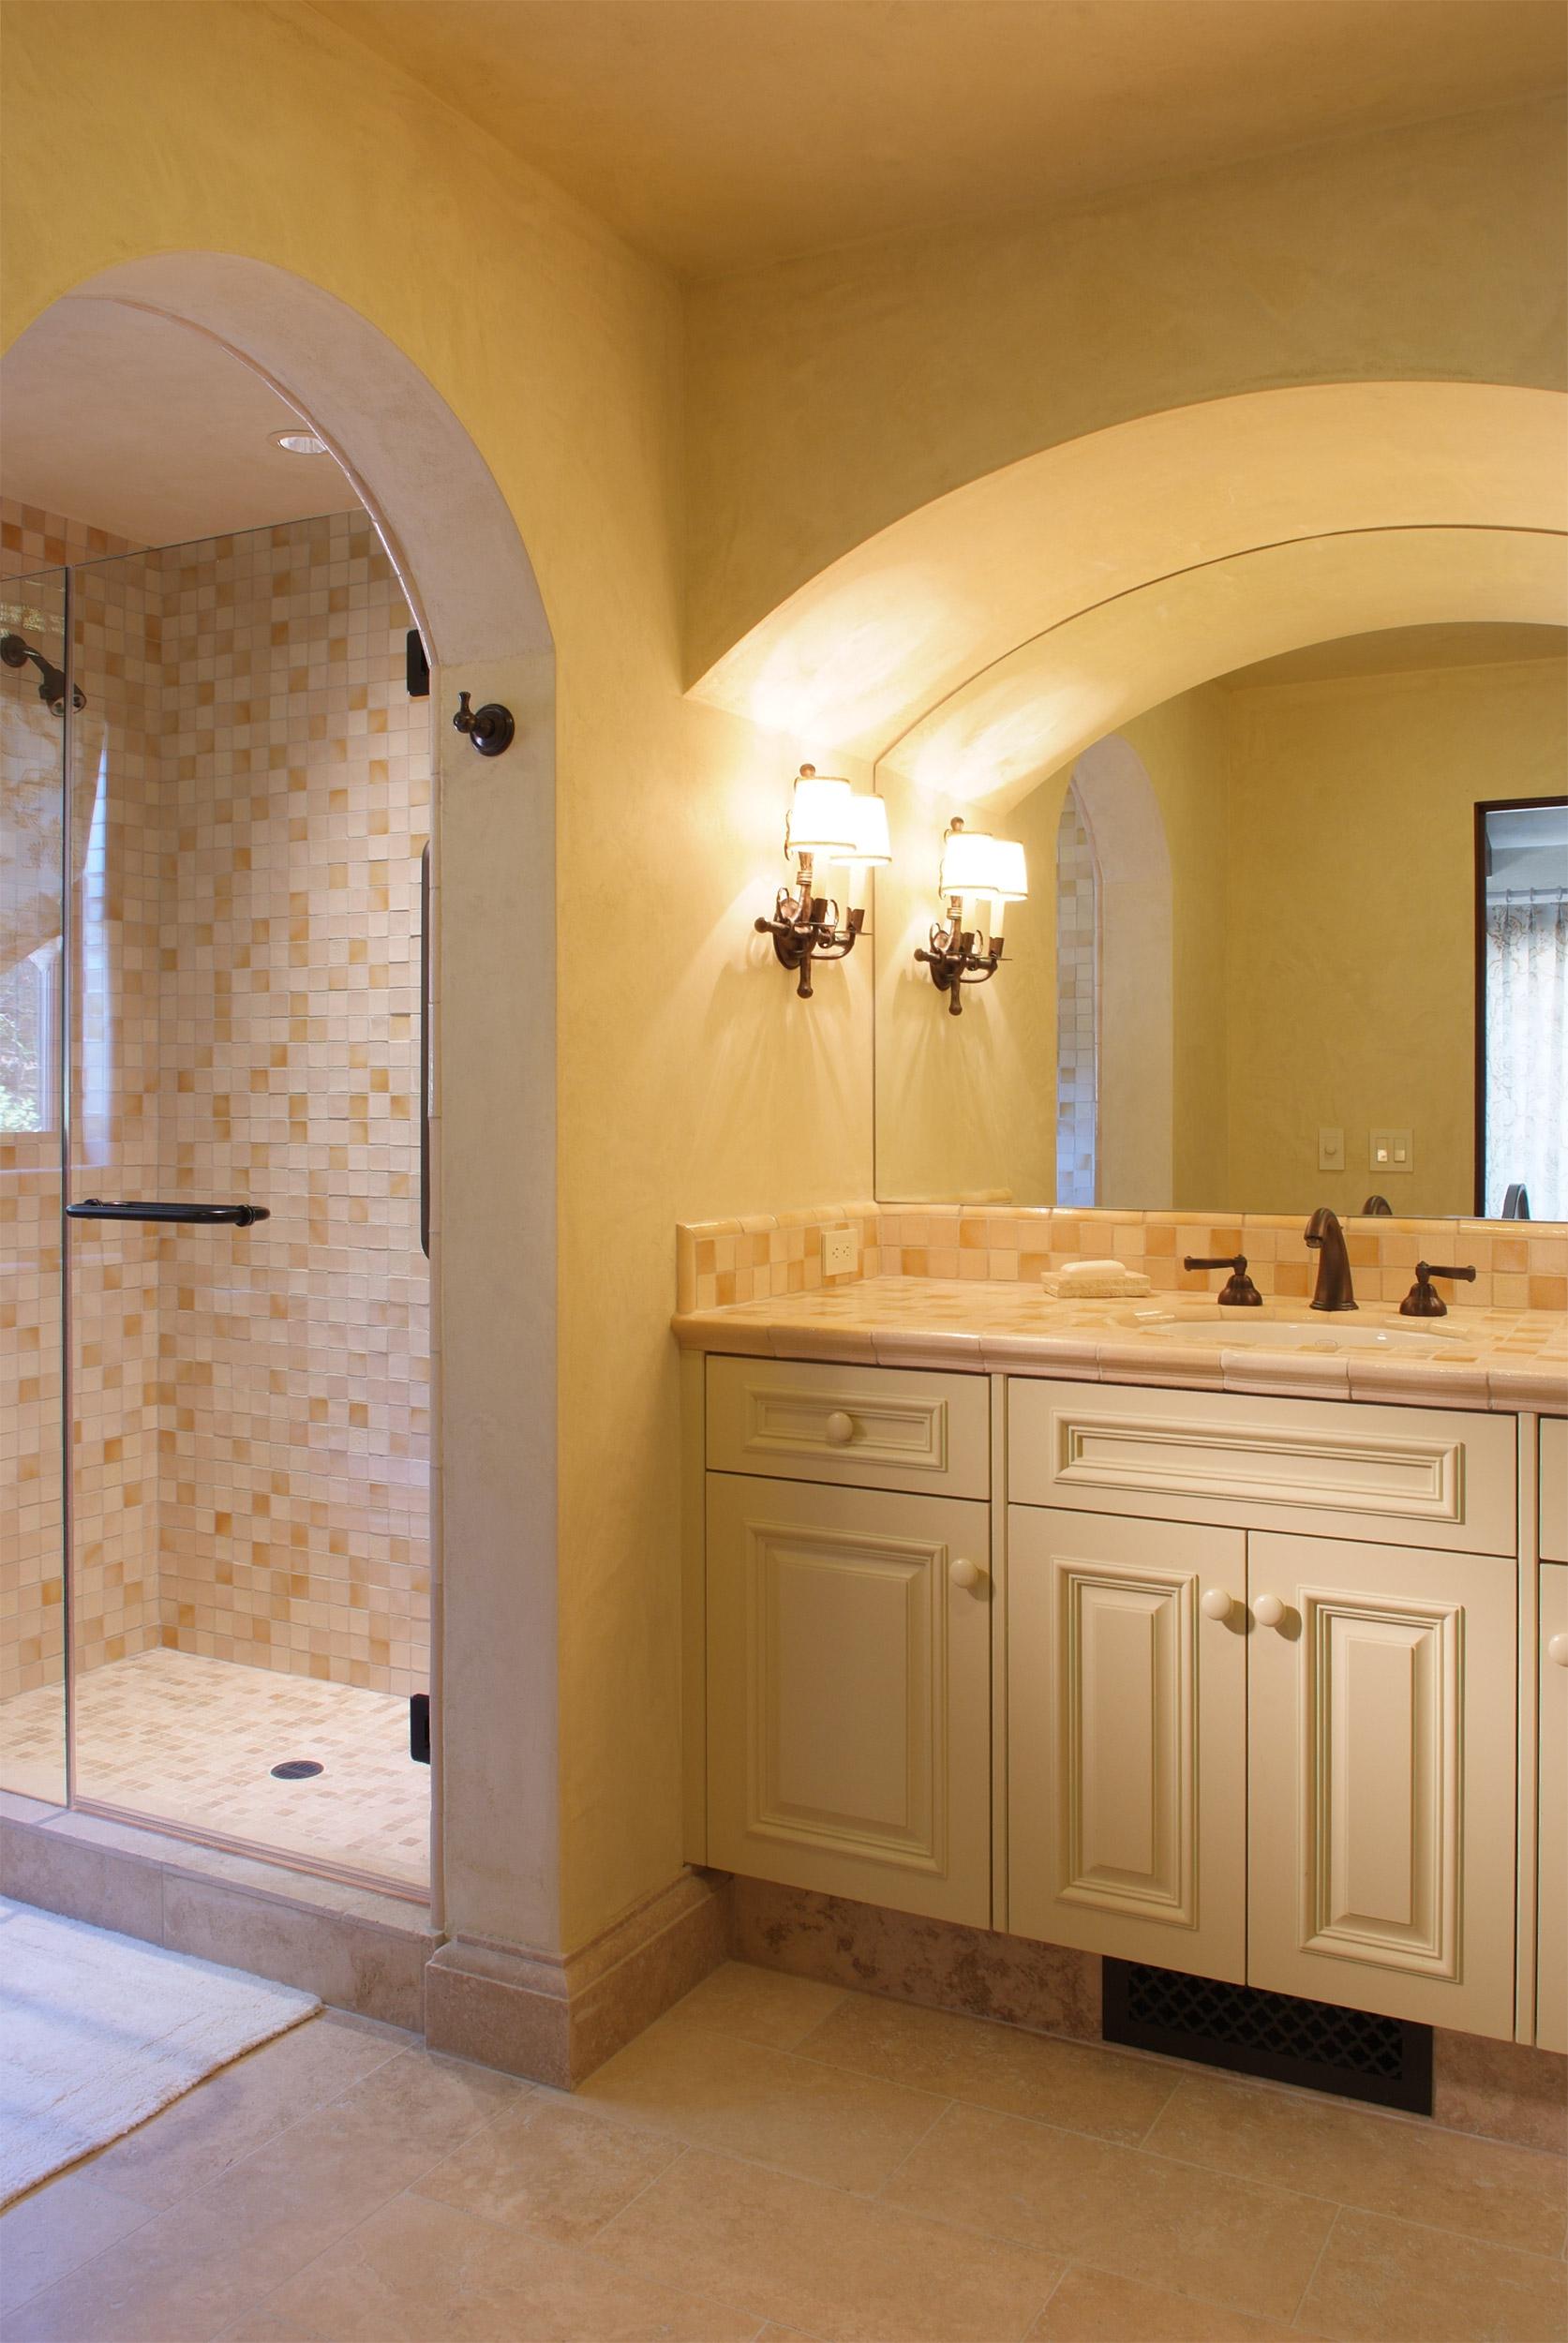 Napa_Valley_Italian_Villa_bathroom_01.jpg